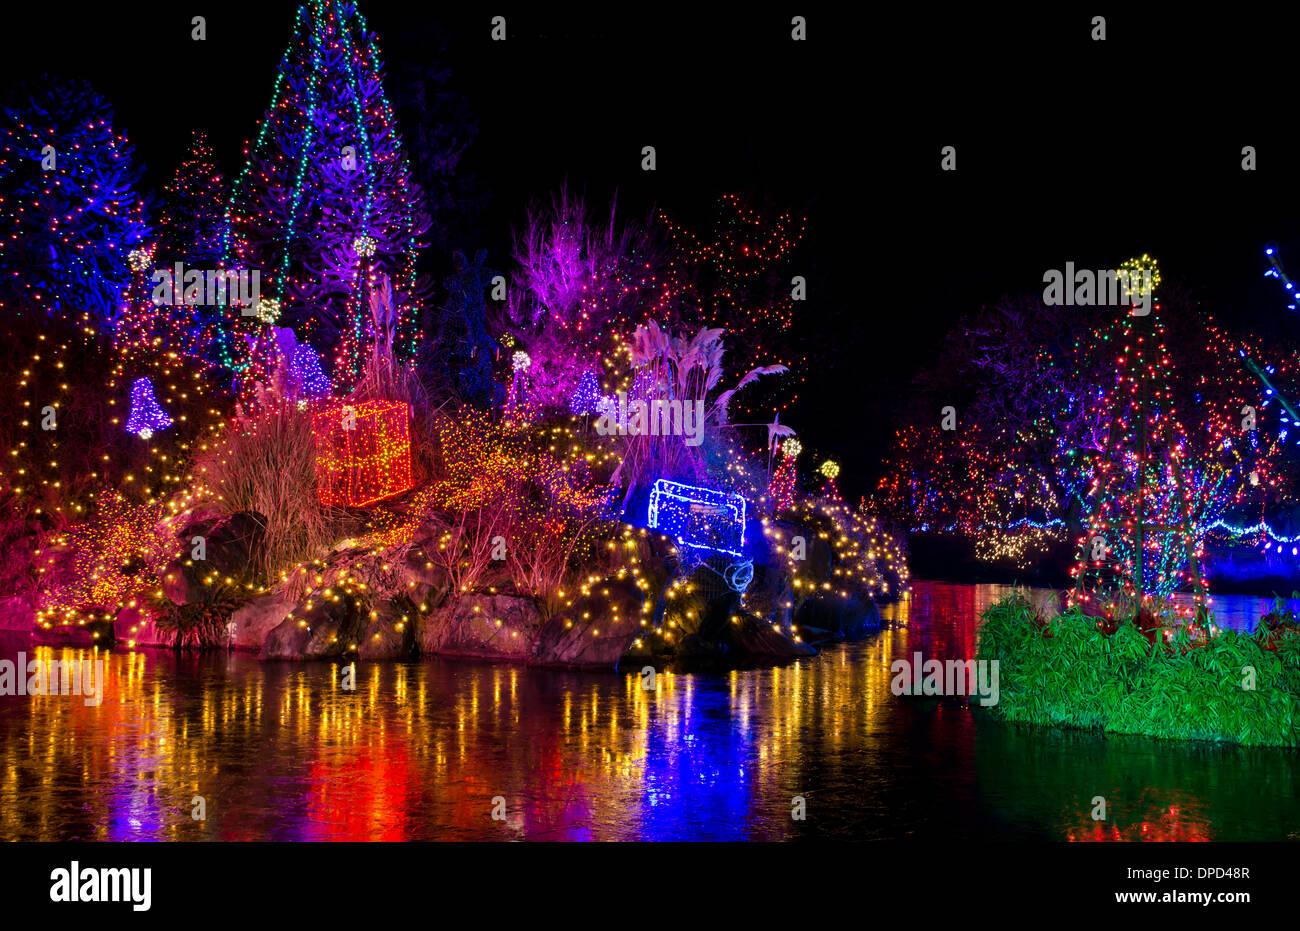 Beautiful Colourful Holiday Light Show At Van Dusen Botanical Gardens Stock Photo Royalty Free